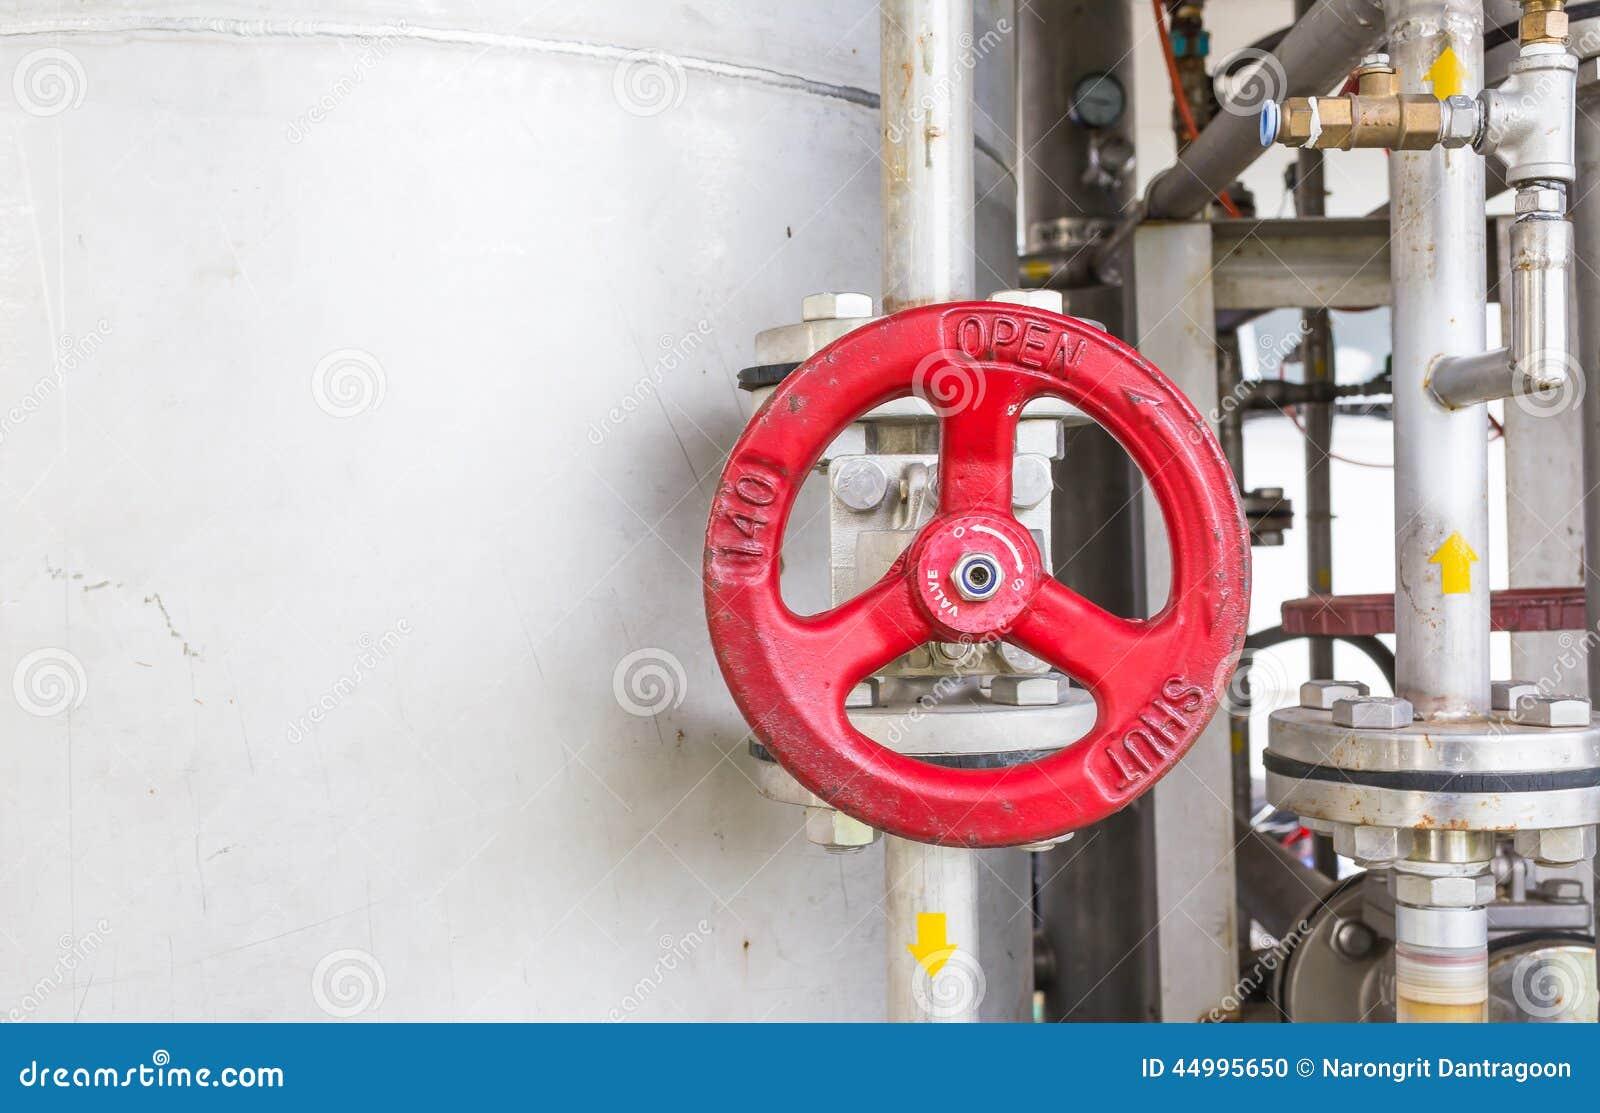 8c77d2974 Ciérrese encima de tiro de la imagen comercial de la válvula de control